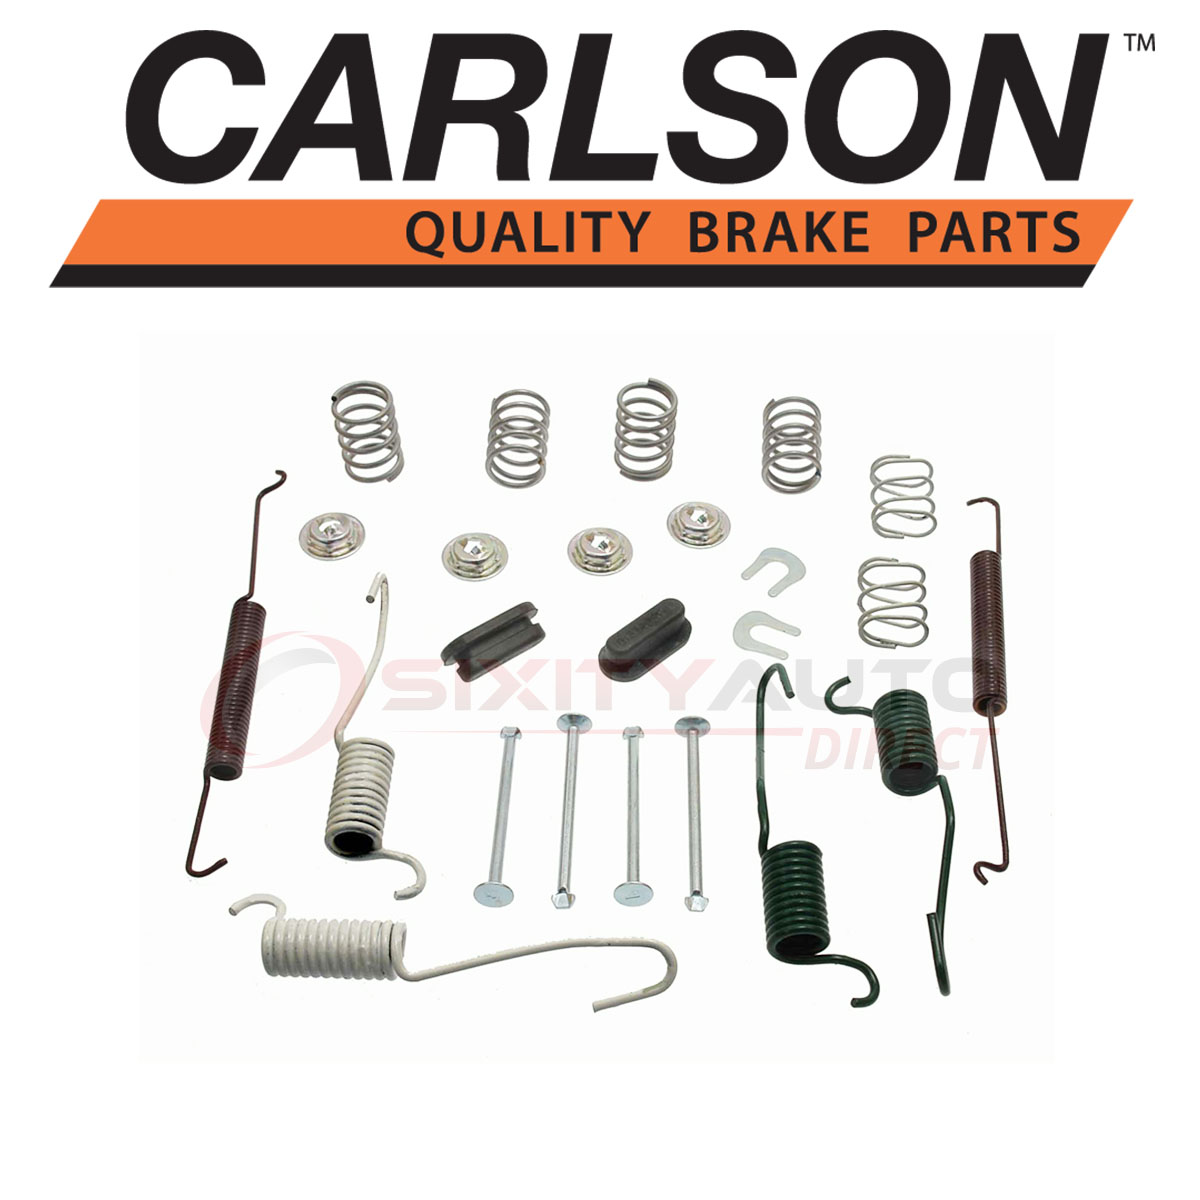 Fits 1995-2009 Ford Ranger Drum Brake Hardware Kit Rear Carlson 94793RY 1998 200